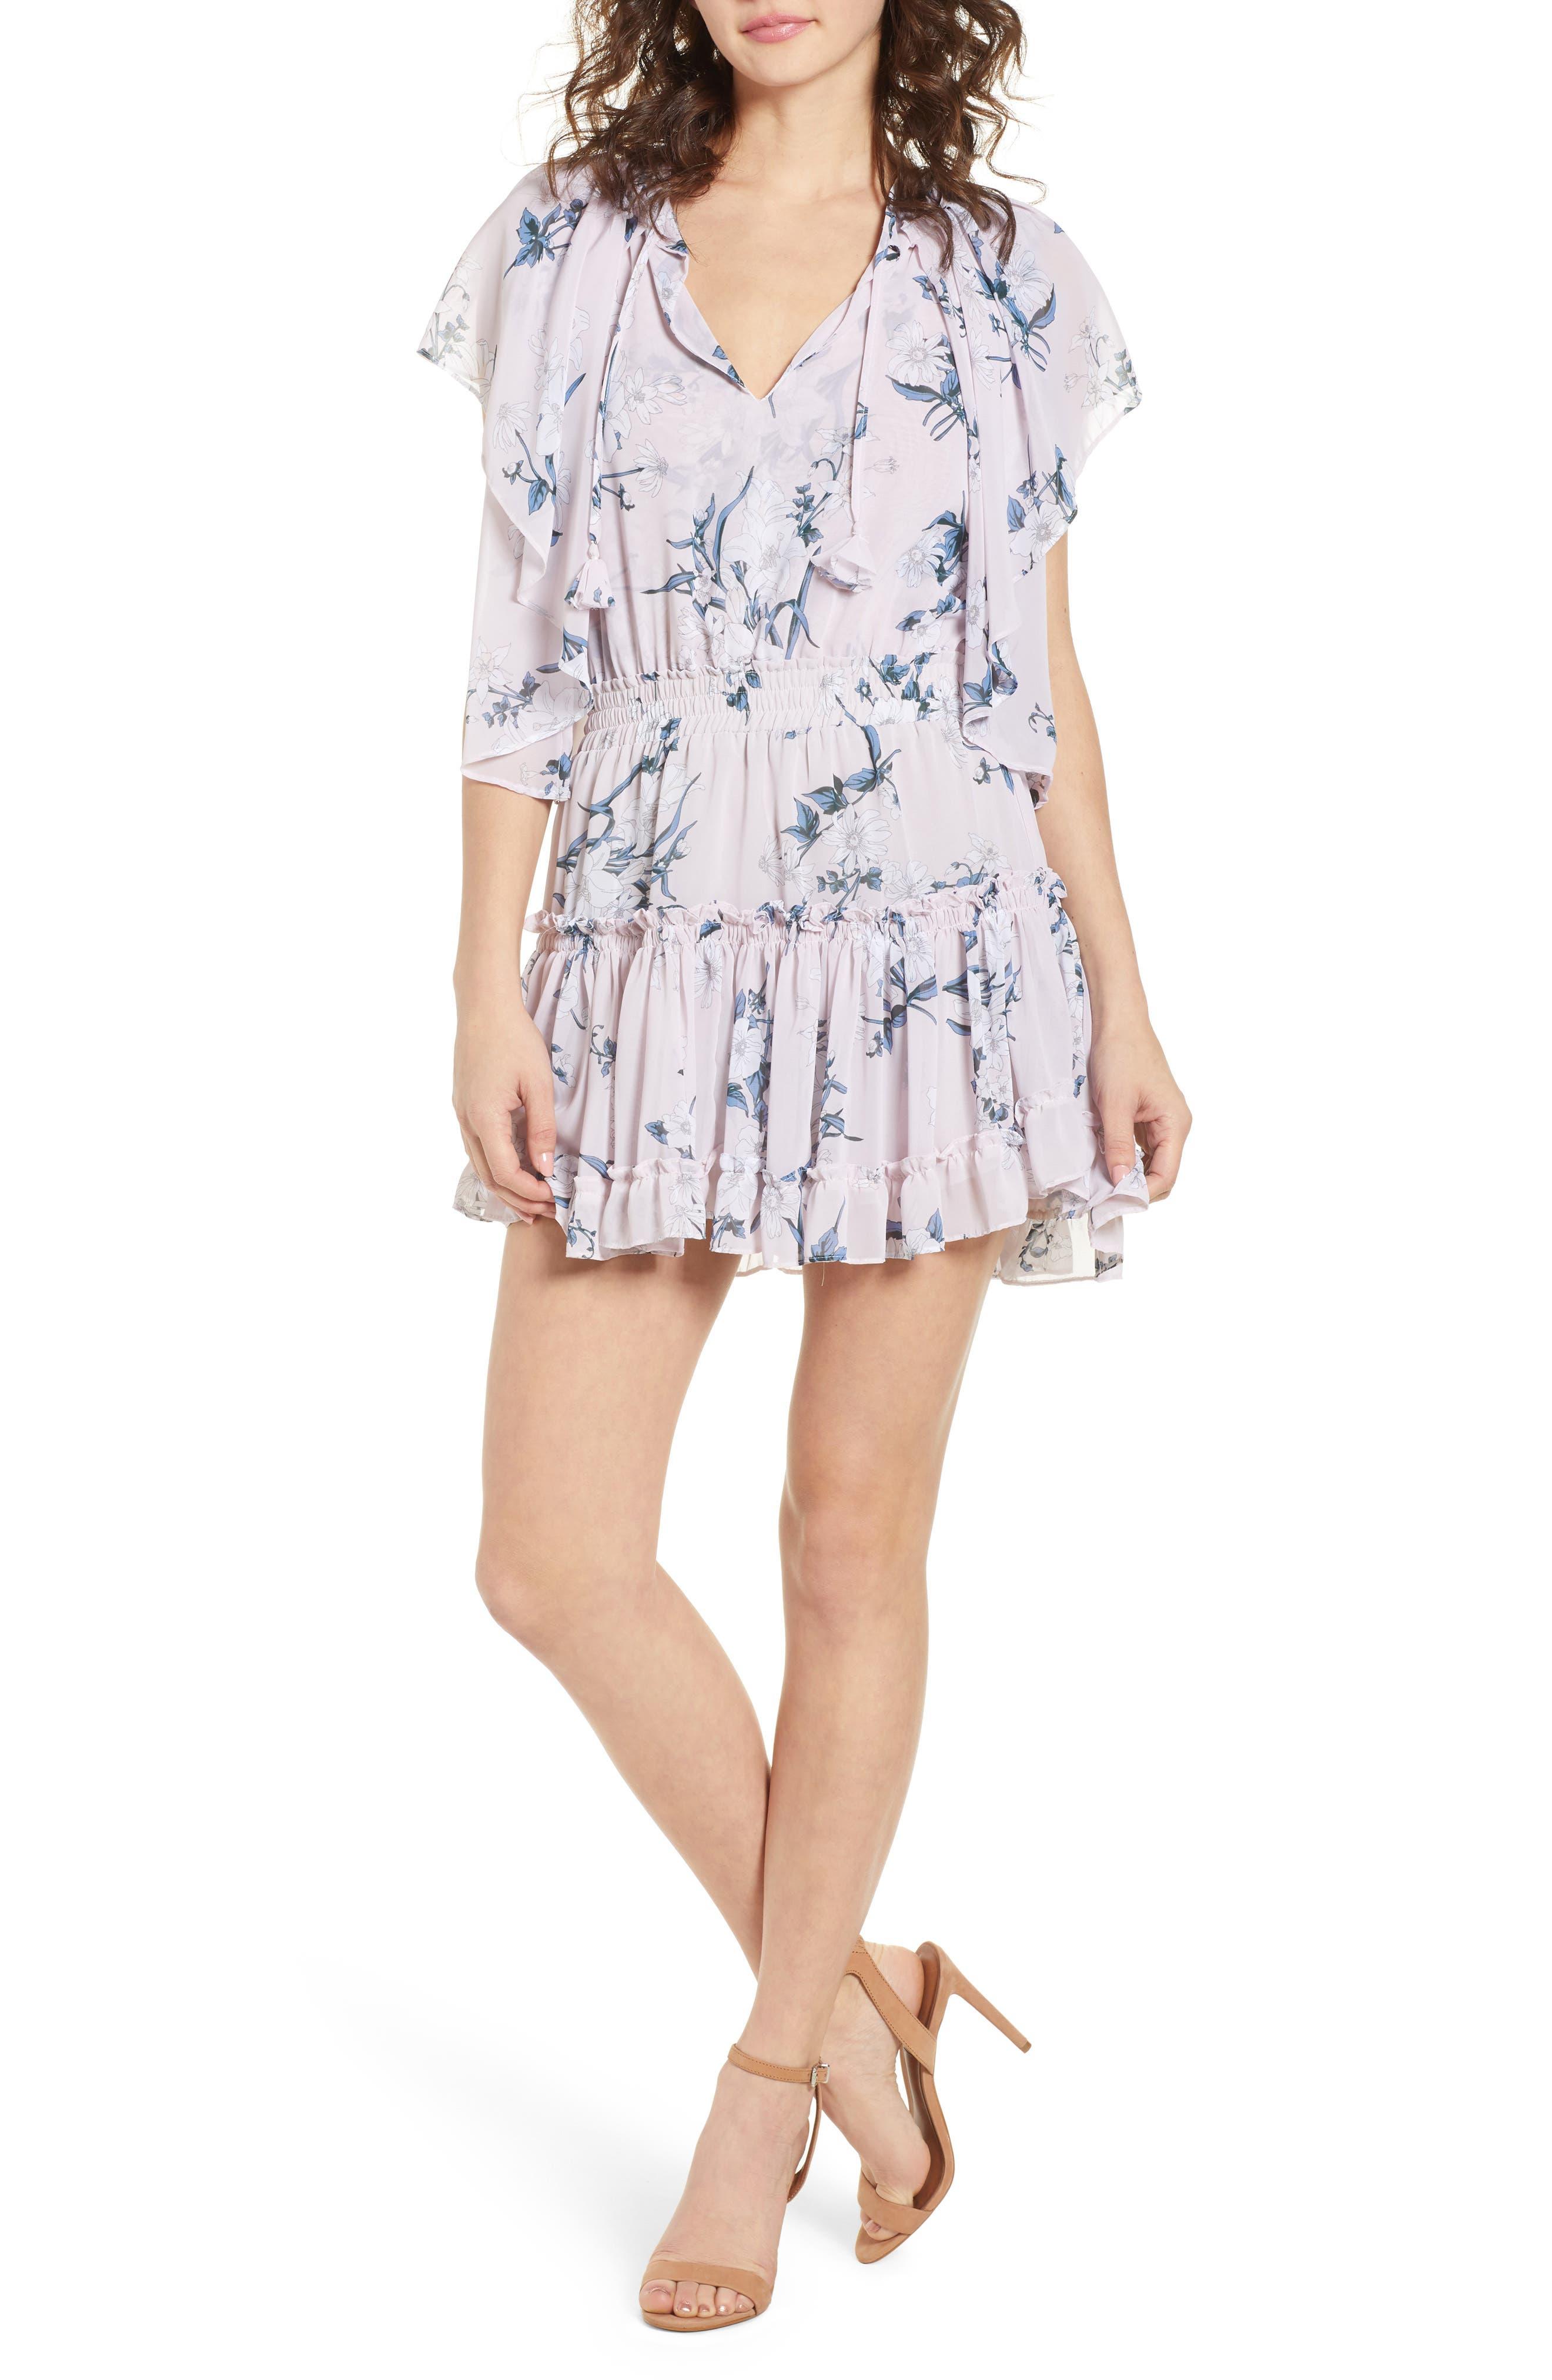 Lullu Dress,                         Main,                         color, Multi Fe15